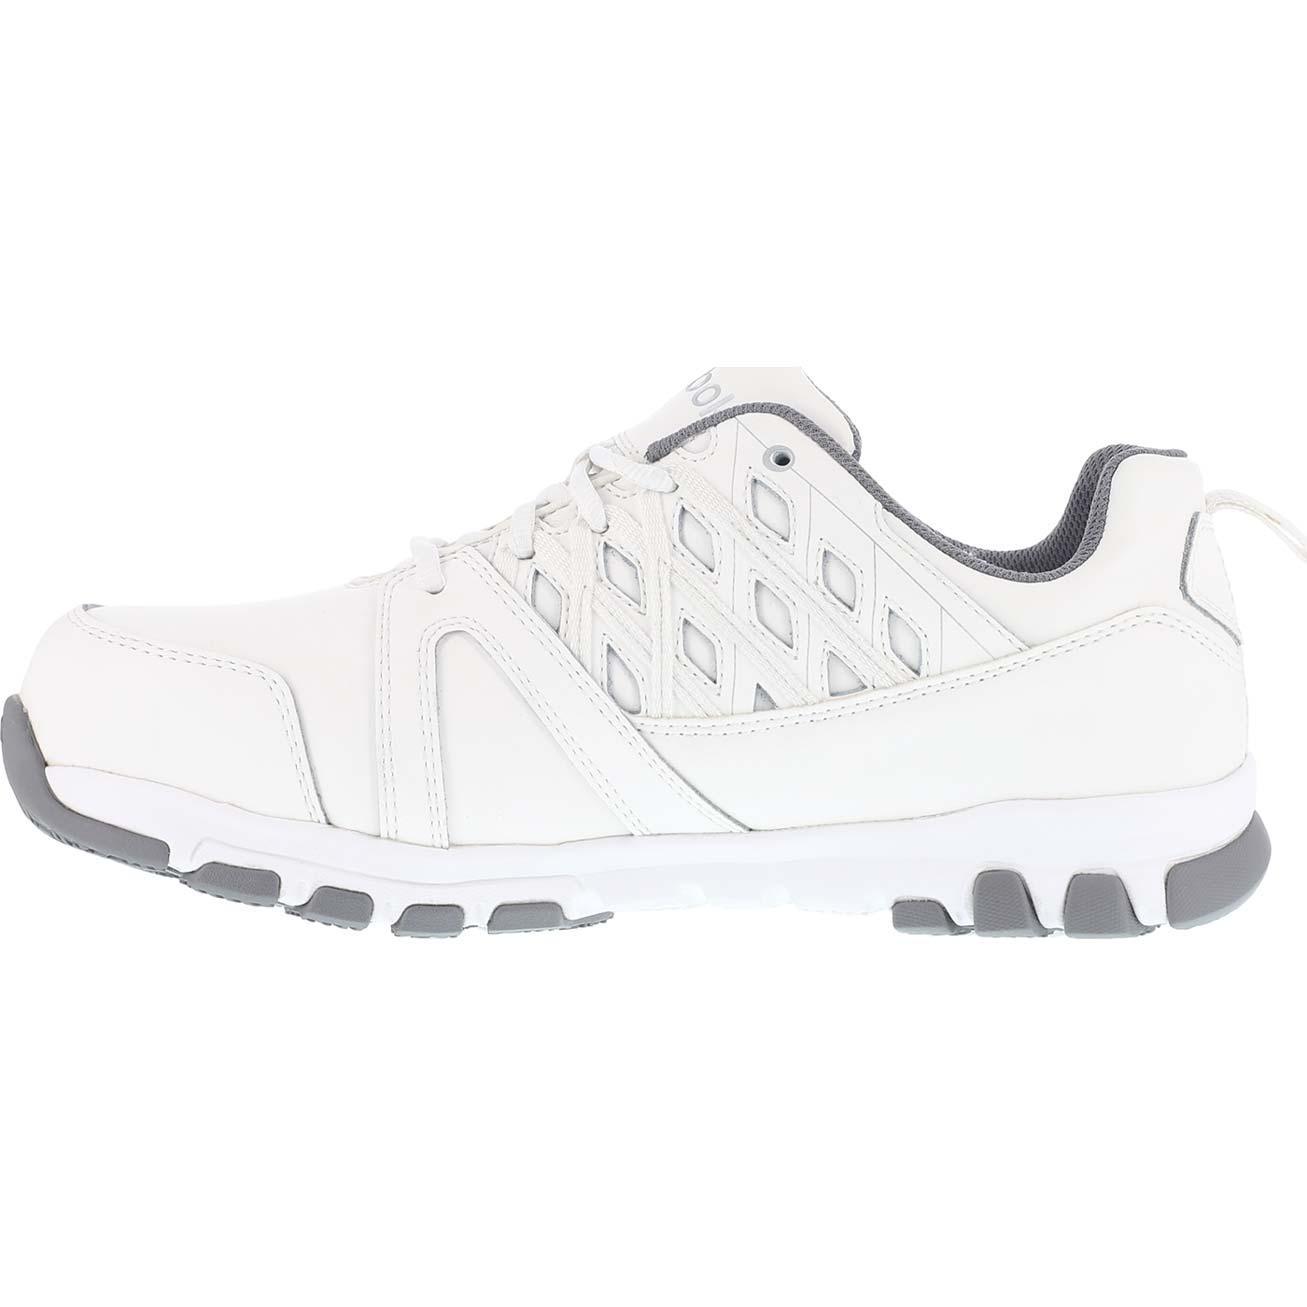 e8499b0bb6a Images. Reebok Sublite Work Women s Steel Toe Static-Dissipative Work  Athletic Shoe ...